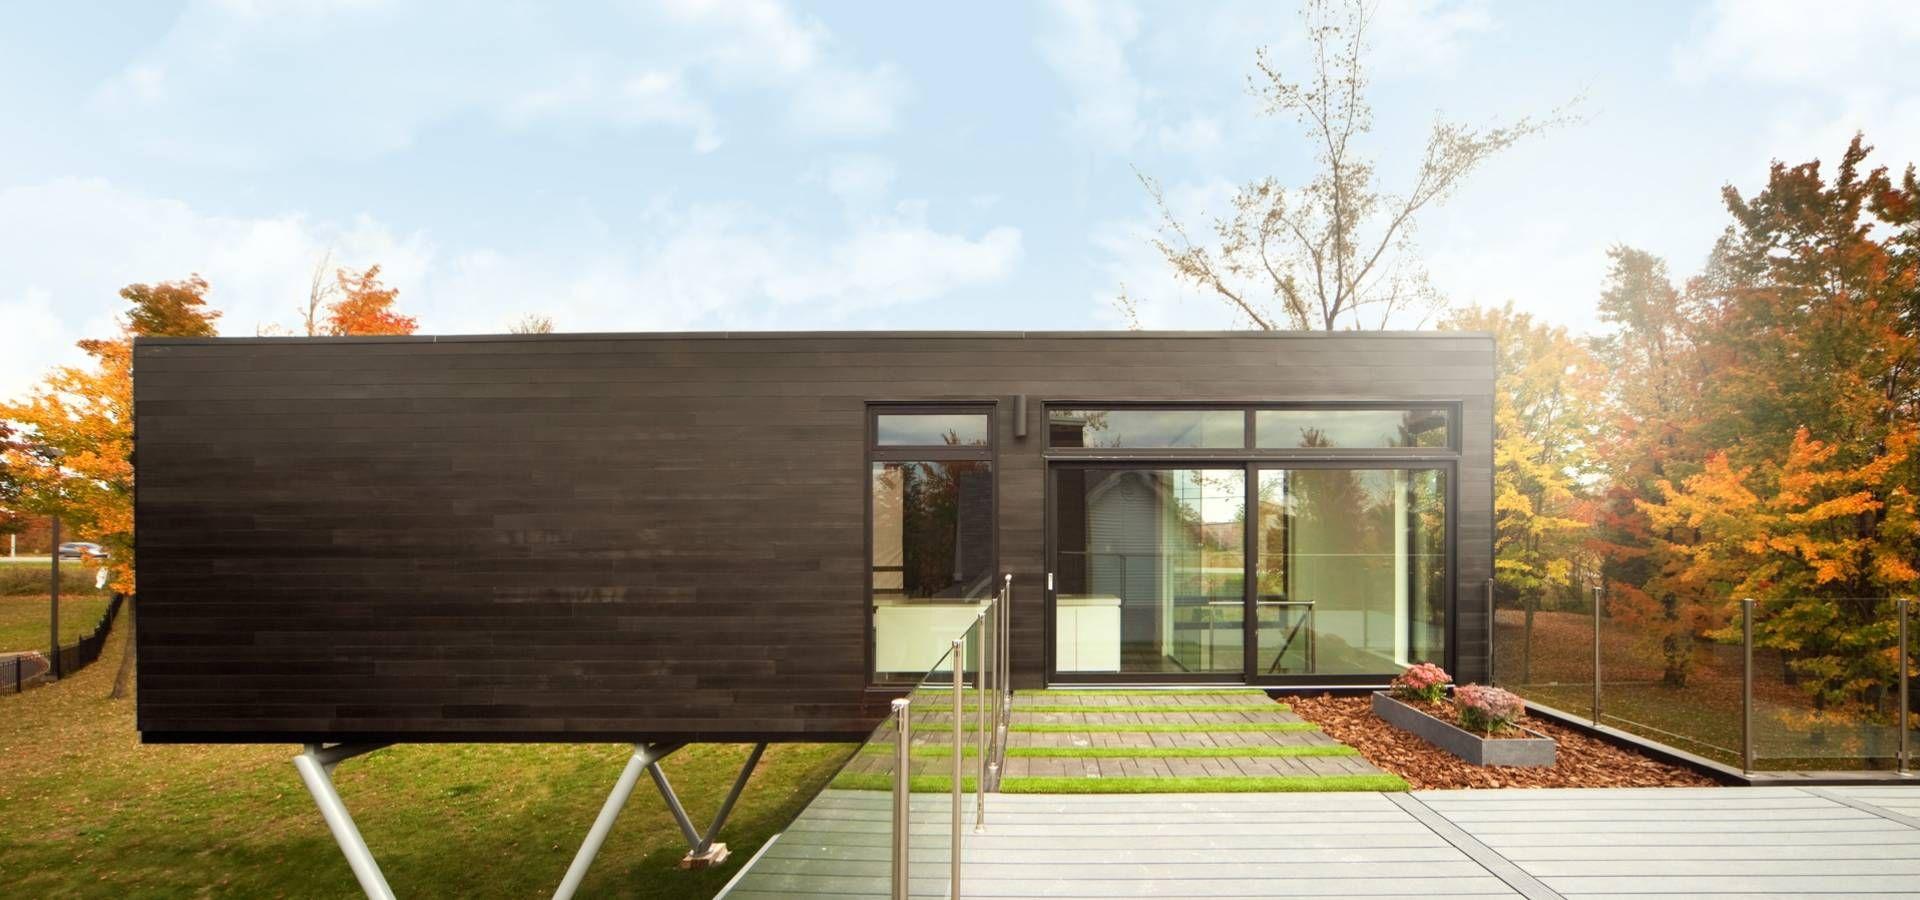 Home- designer build | studio | Pinterest | Modernism, Architecture ...